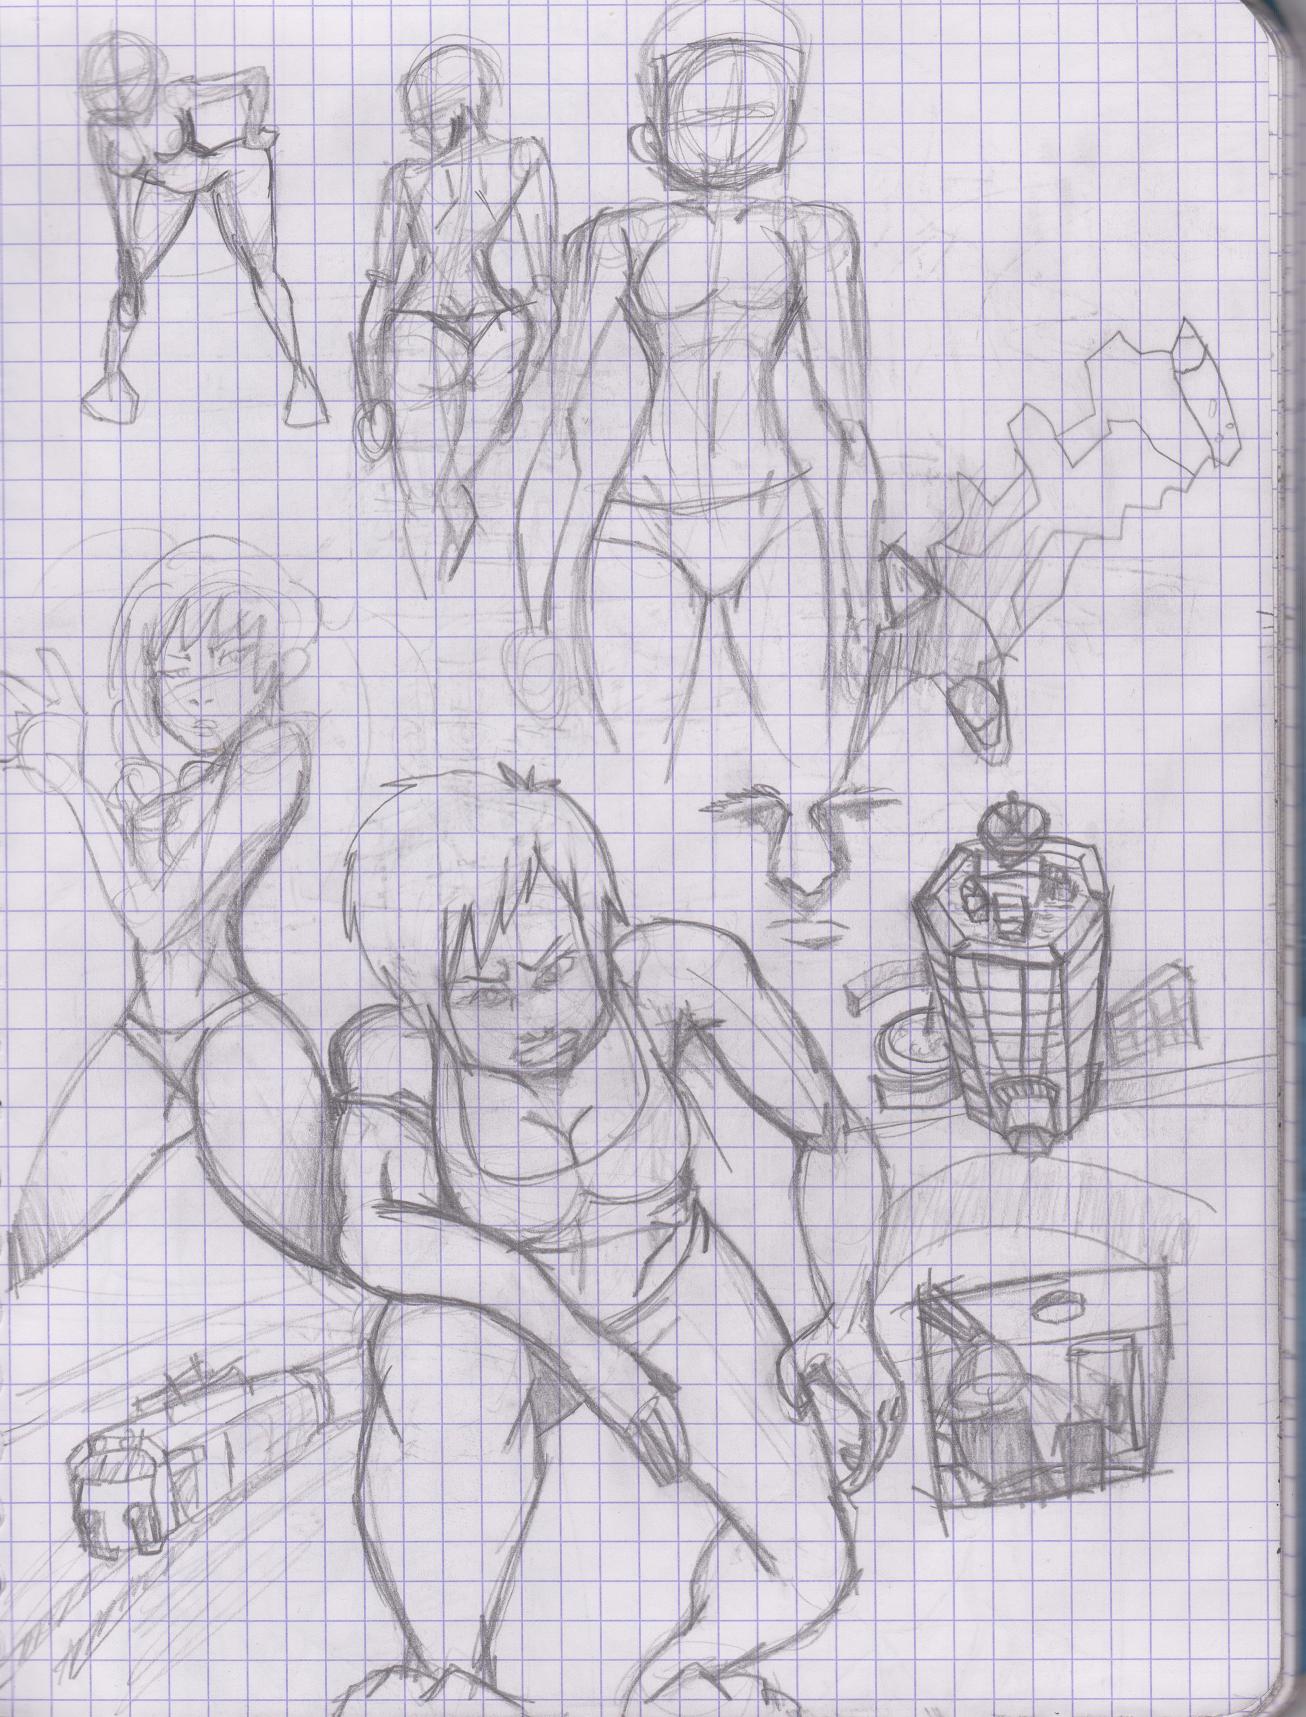 SH sketchbook page 51